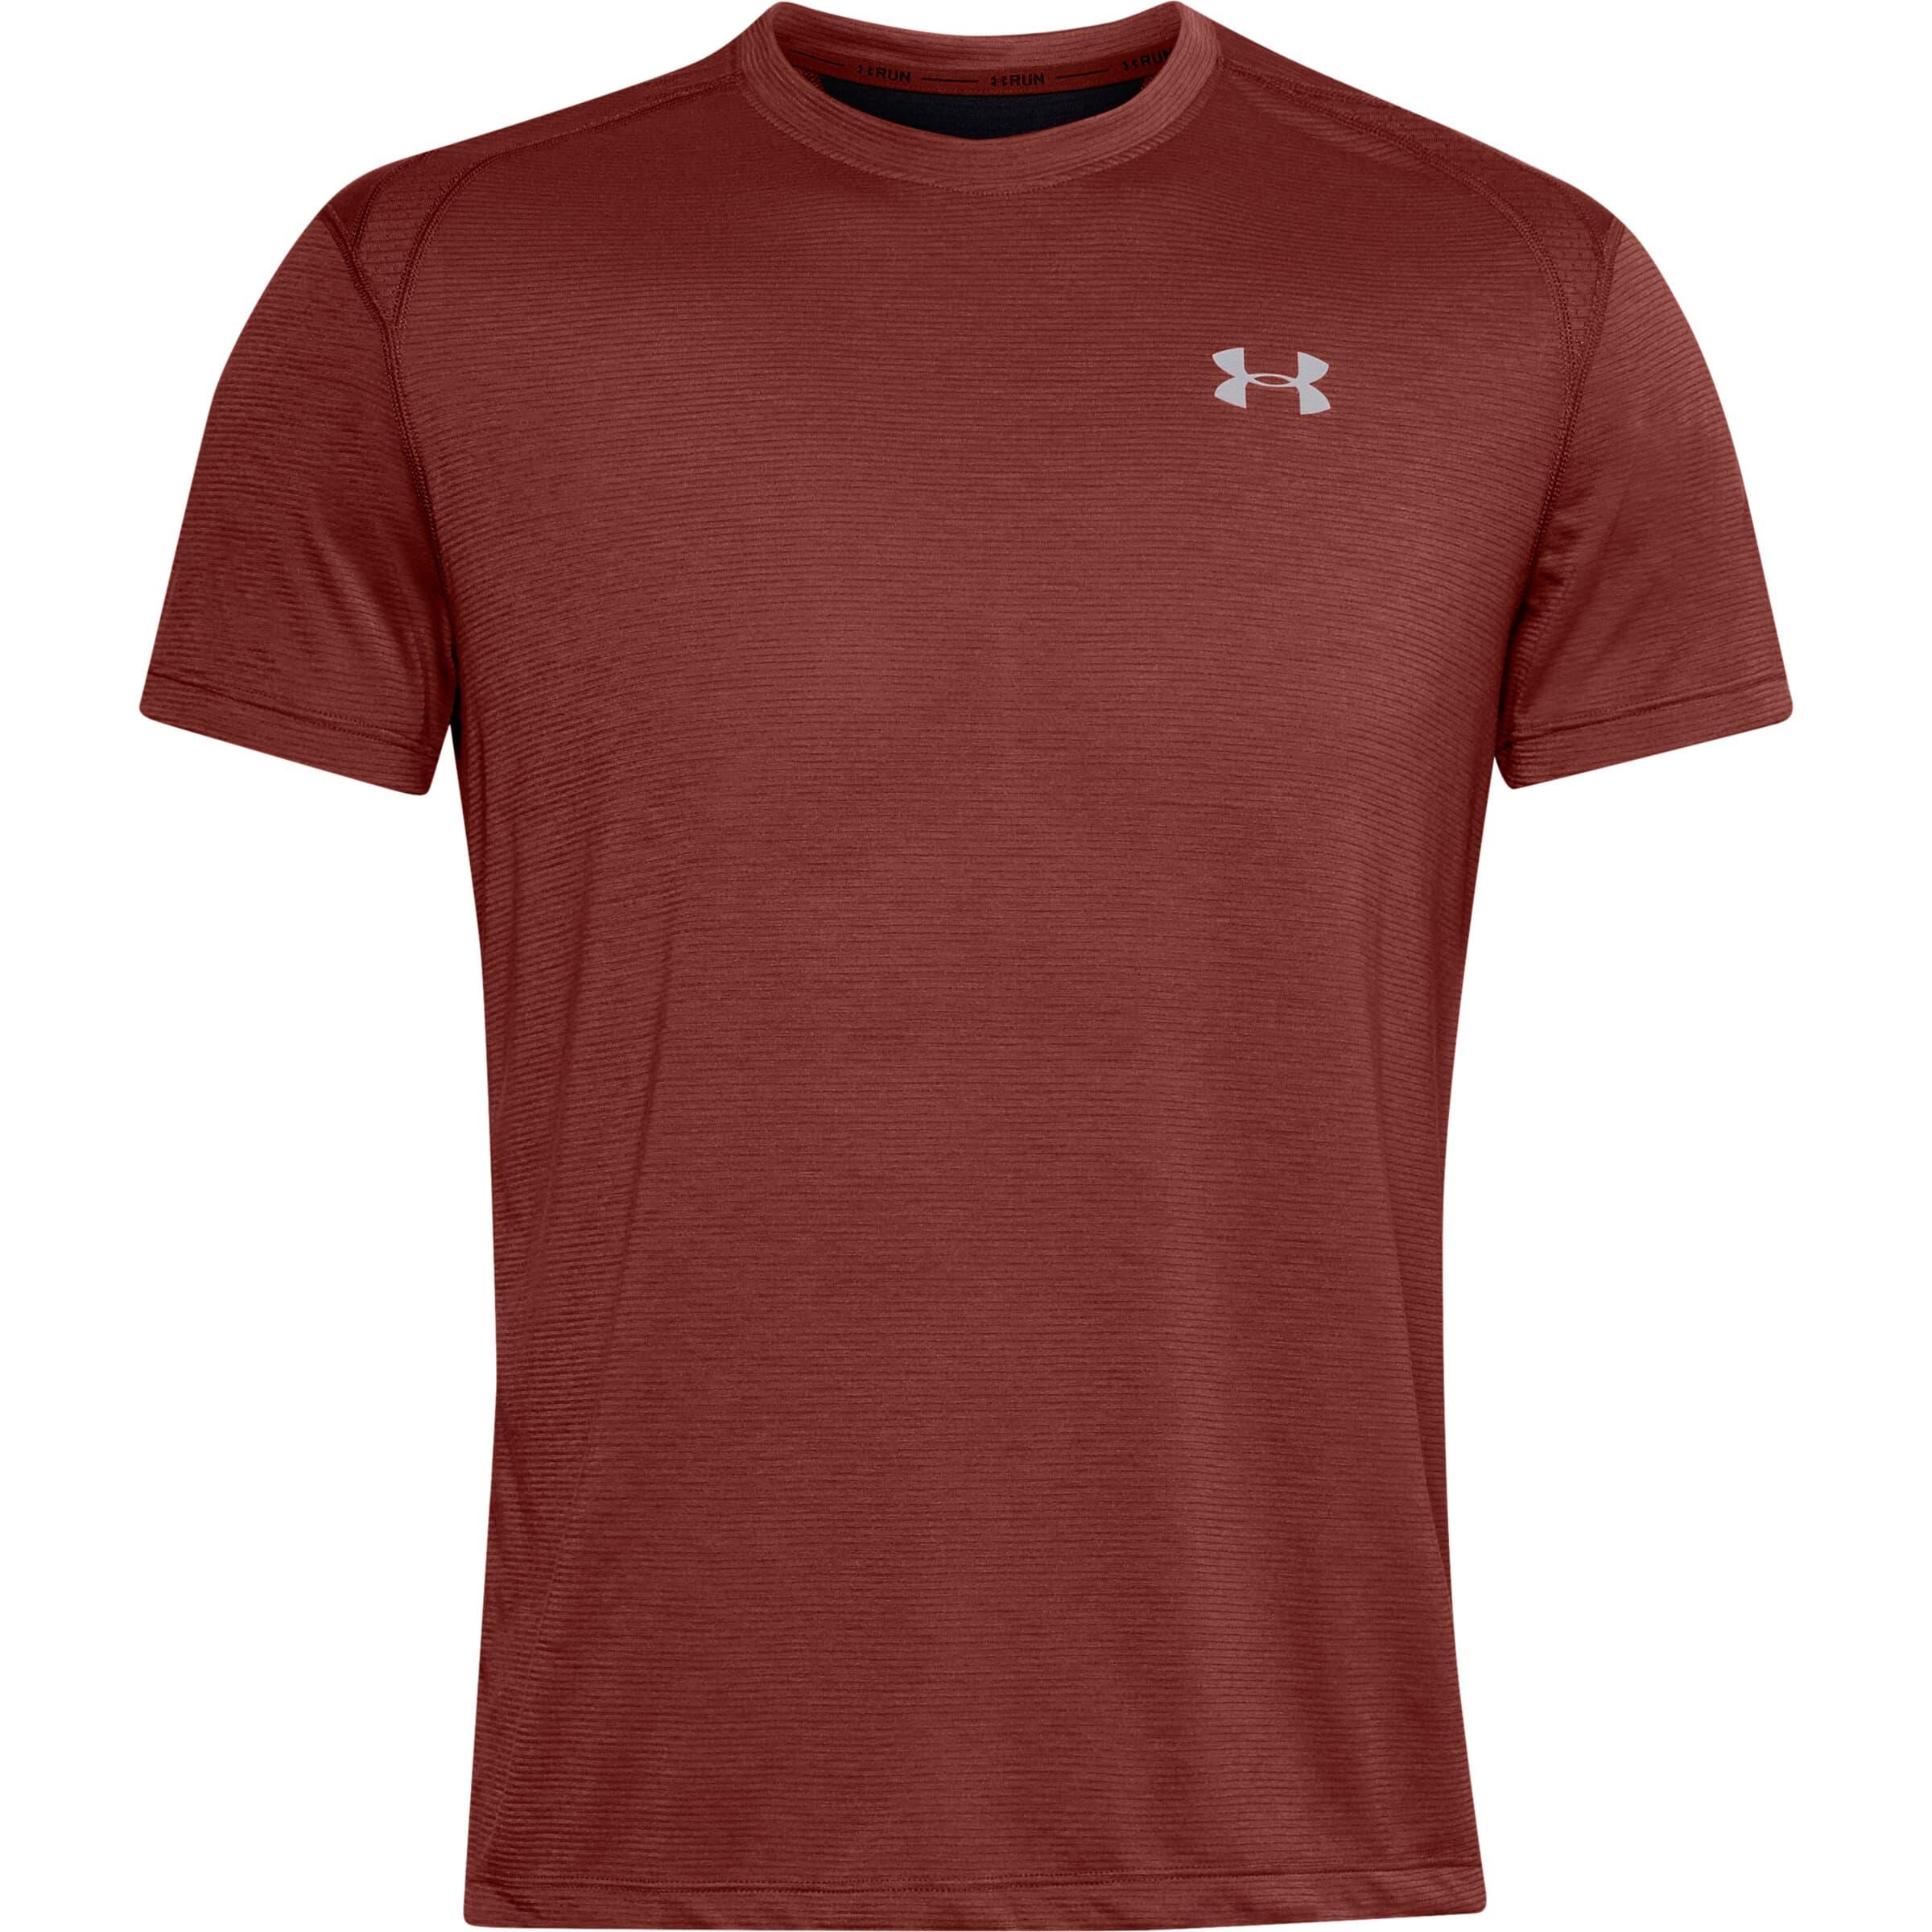 Under Armour Streaker 2.0 Shortstyle Shirt pour homme